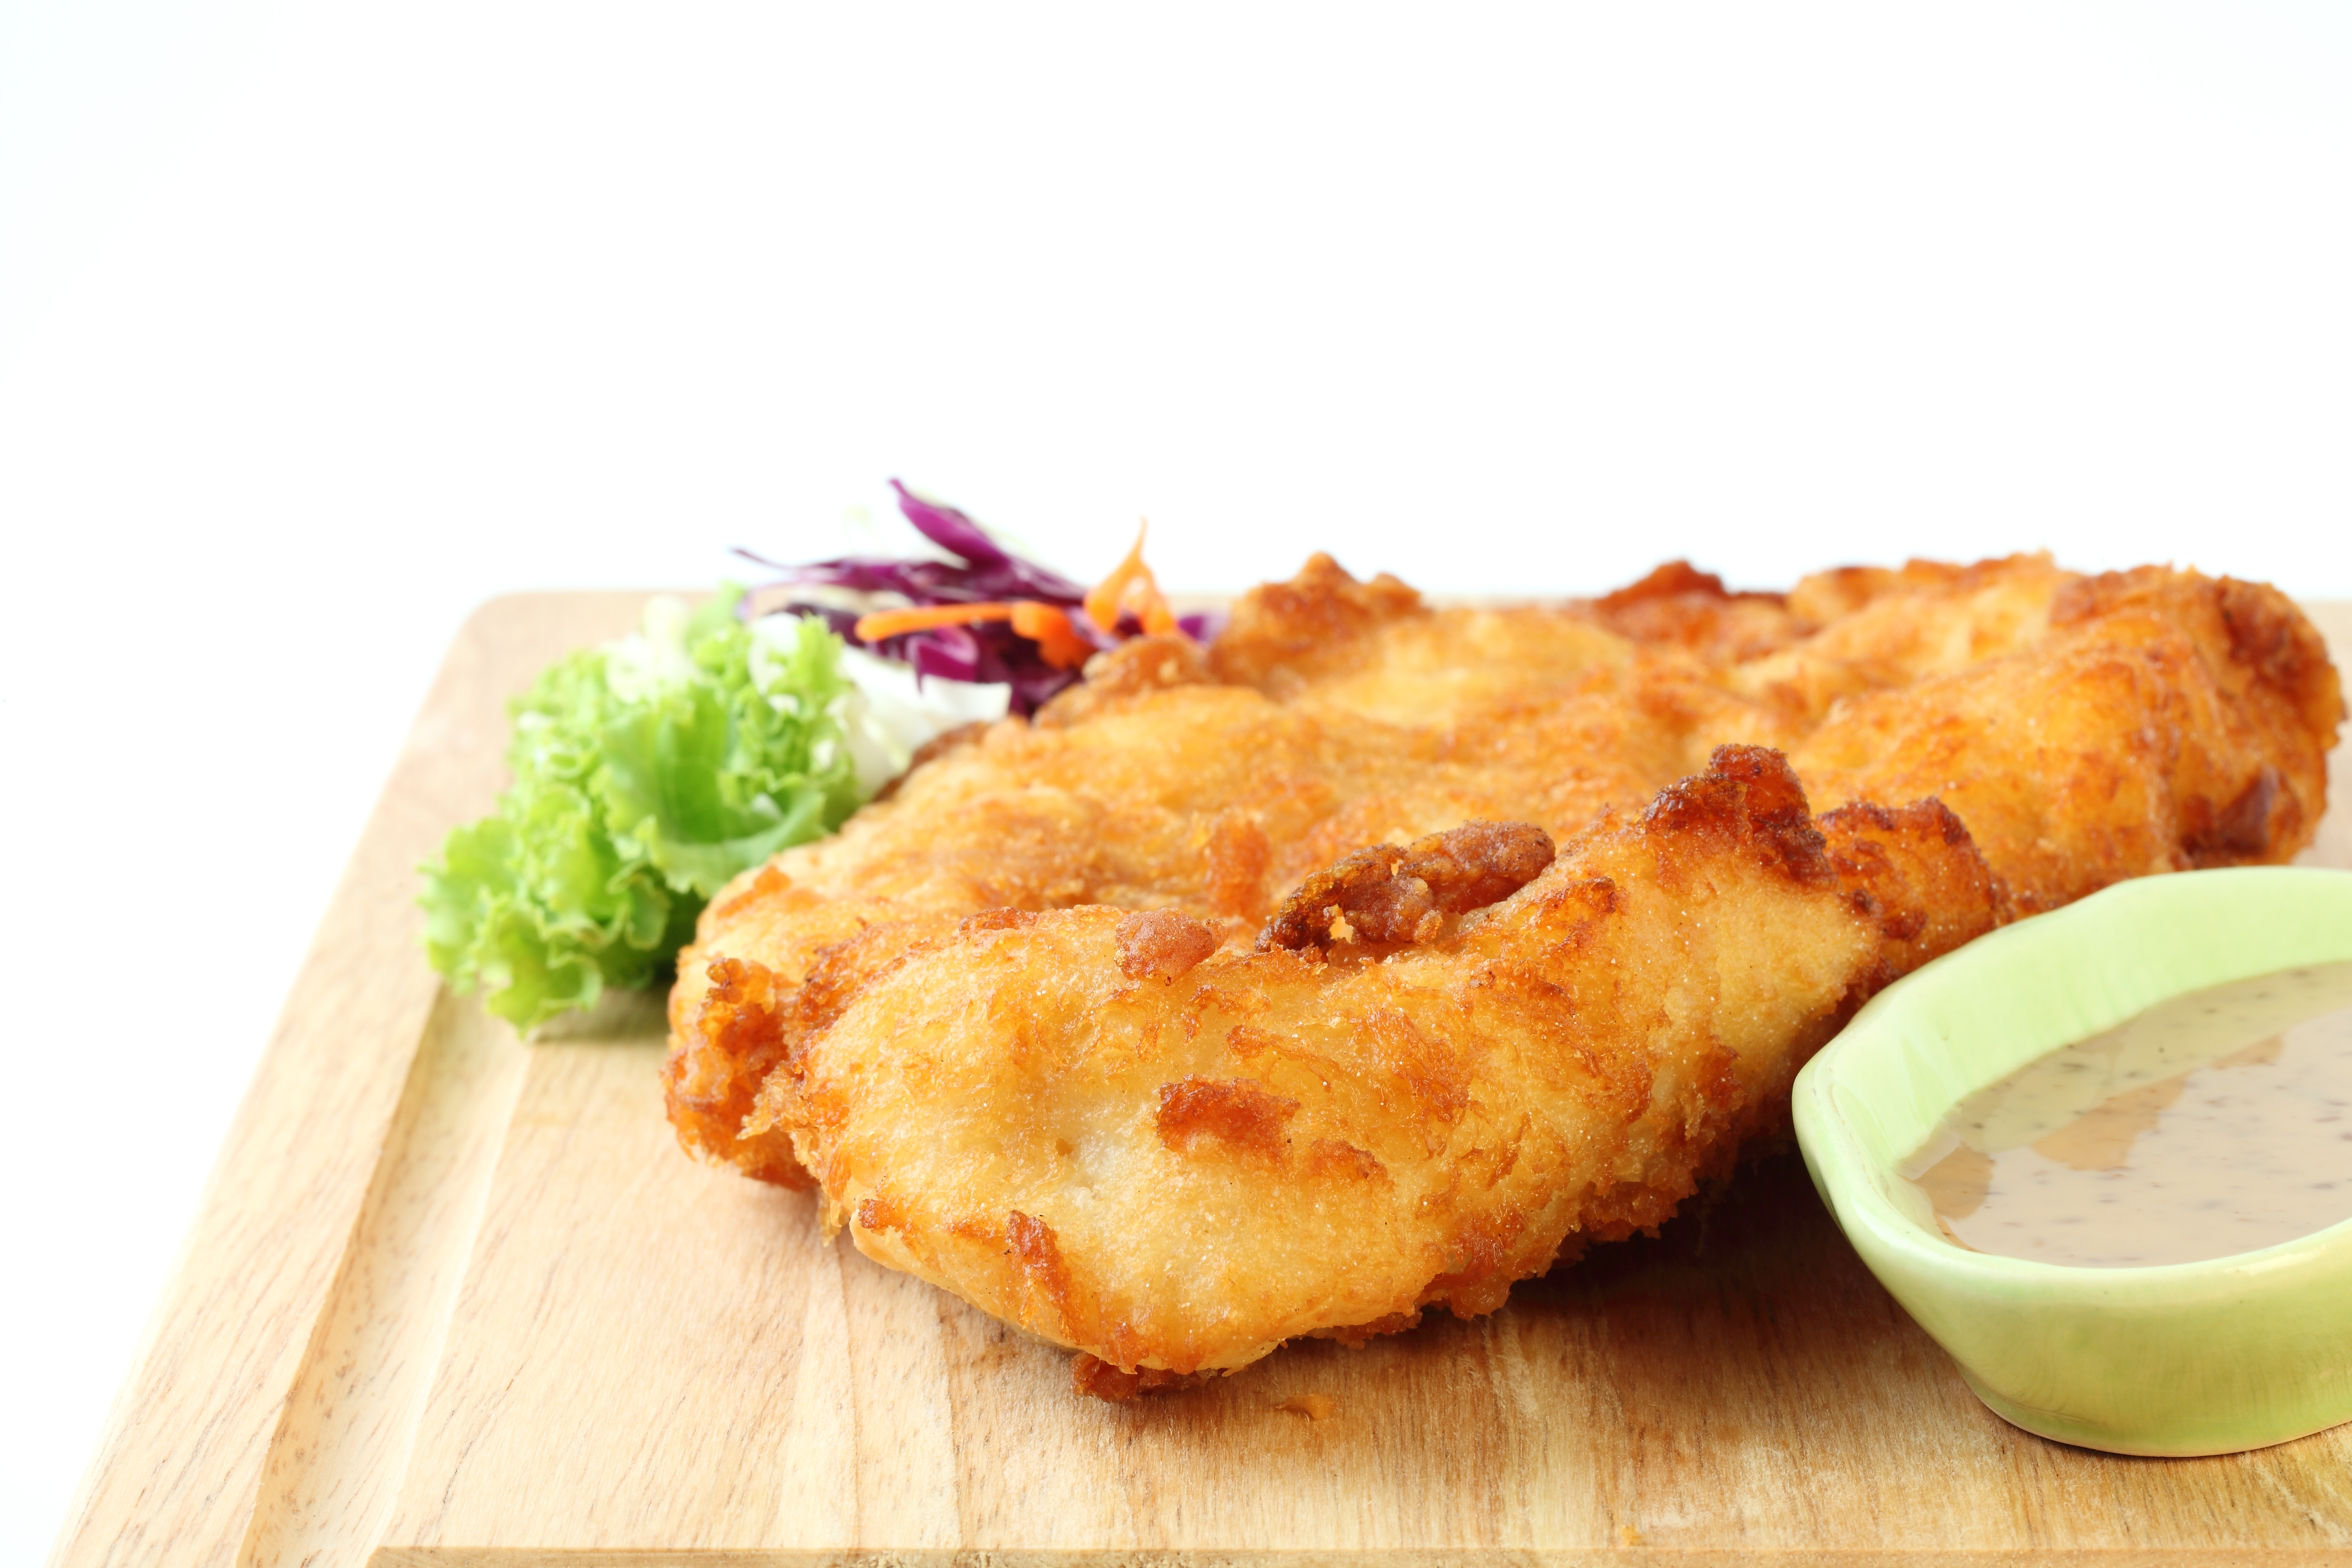 Cod fillets coated cj o louglin for Cod fish fillet